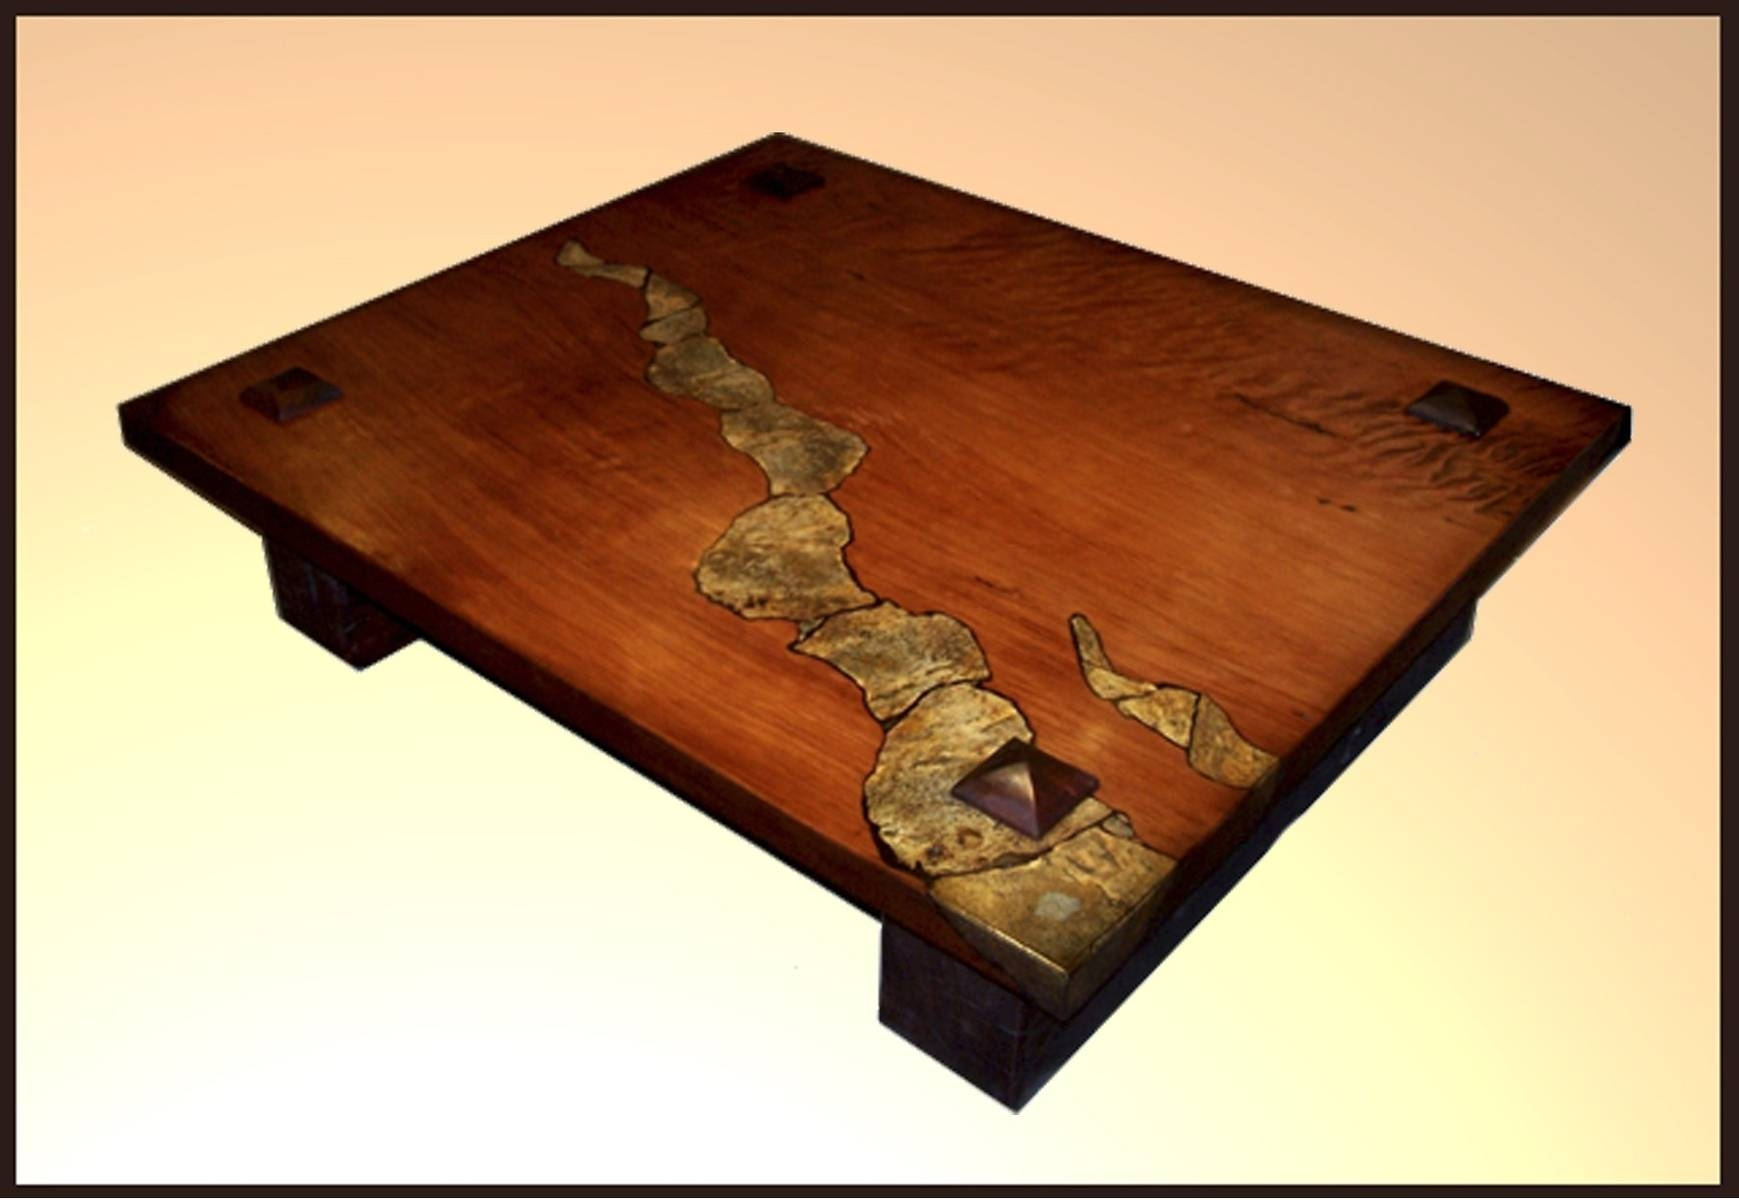 Trendy Black Iron Base Frames Square Stone Coffee Table With Inside Square Stone Coffee Tables (View 22 of 30)